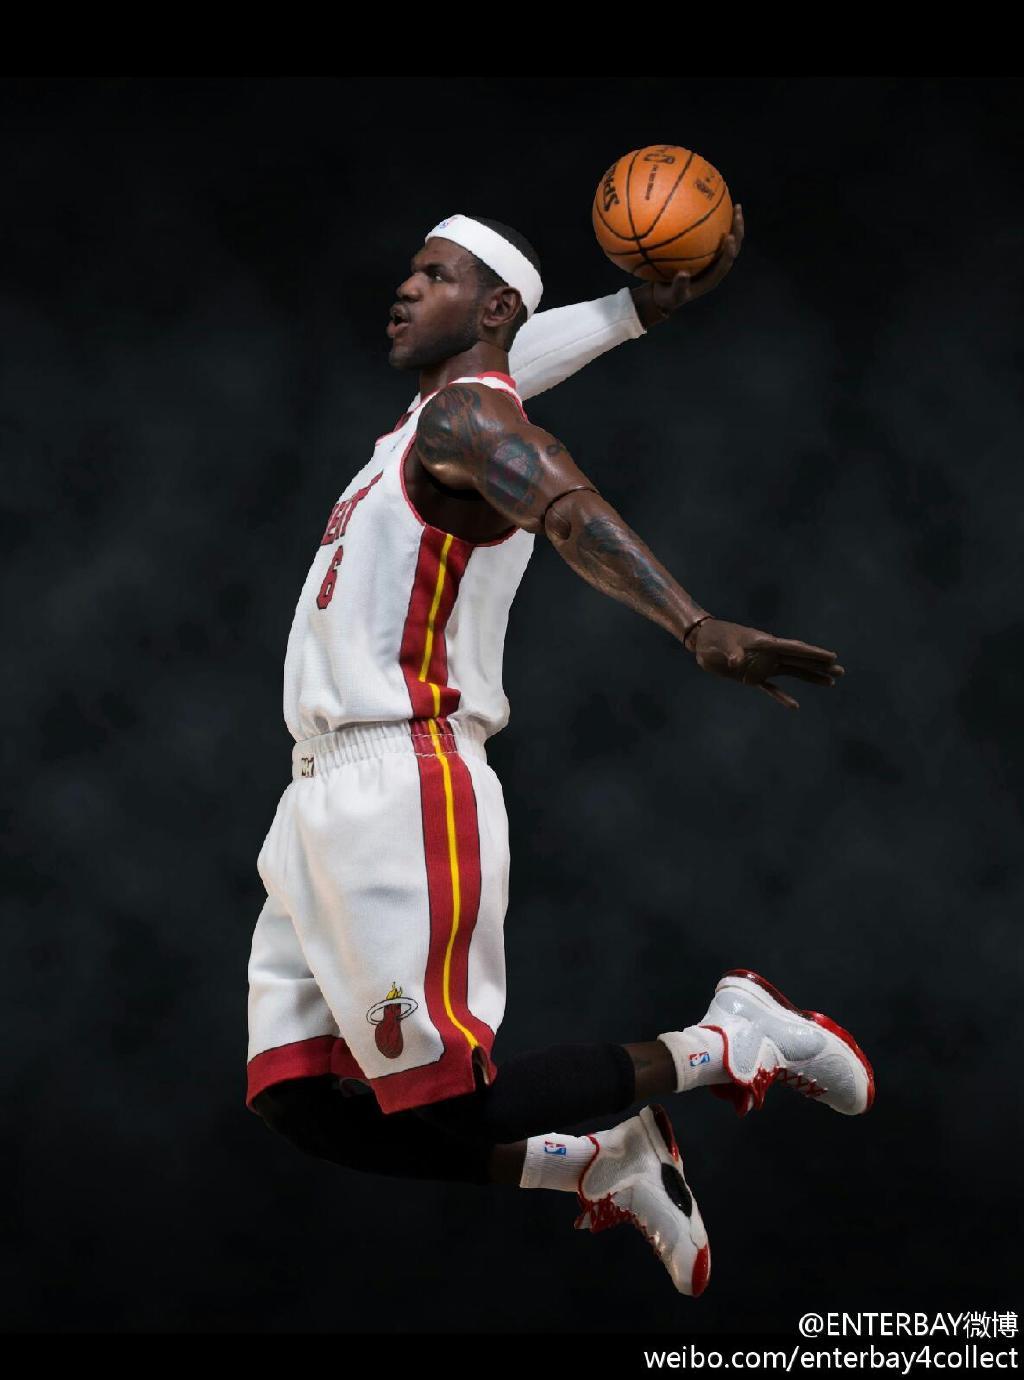 [Enterbay] NBA Real Masterpiece - LeBron James - Página 3 685ebd96jw1e5vm9x3slgj20wz18gq59